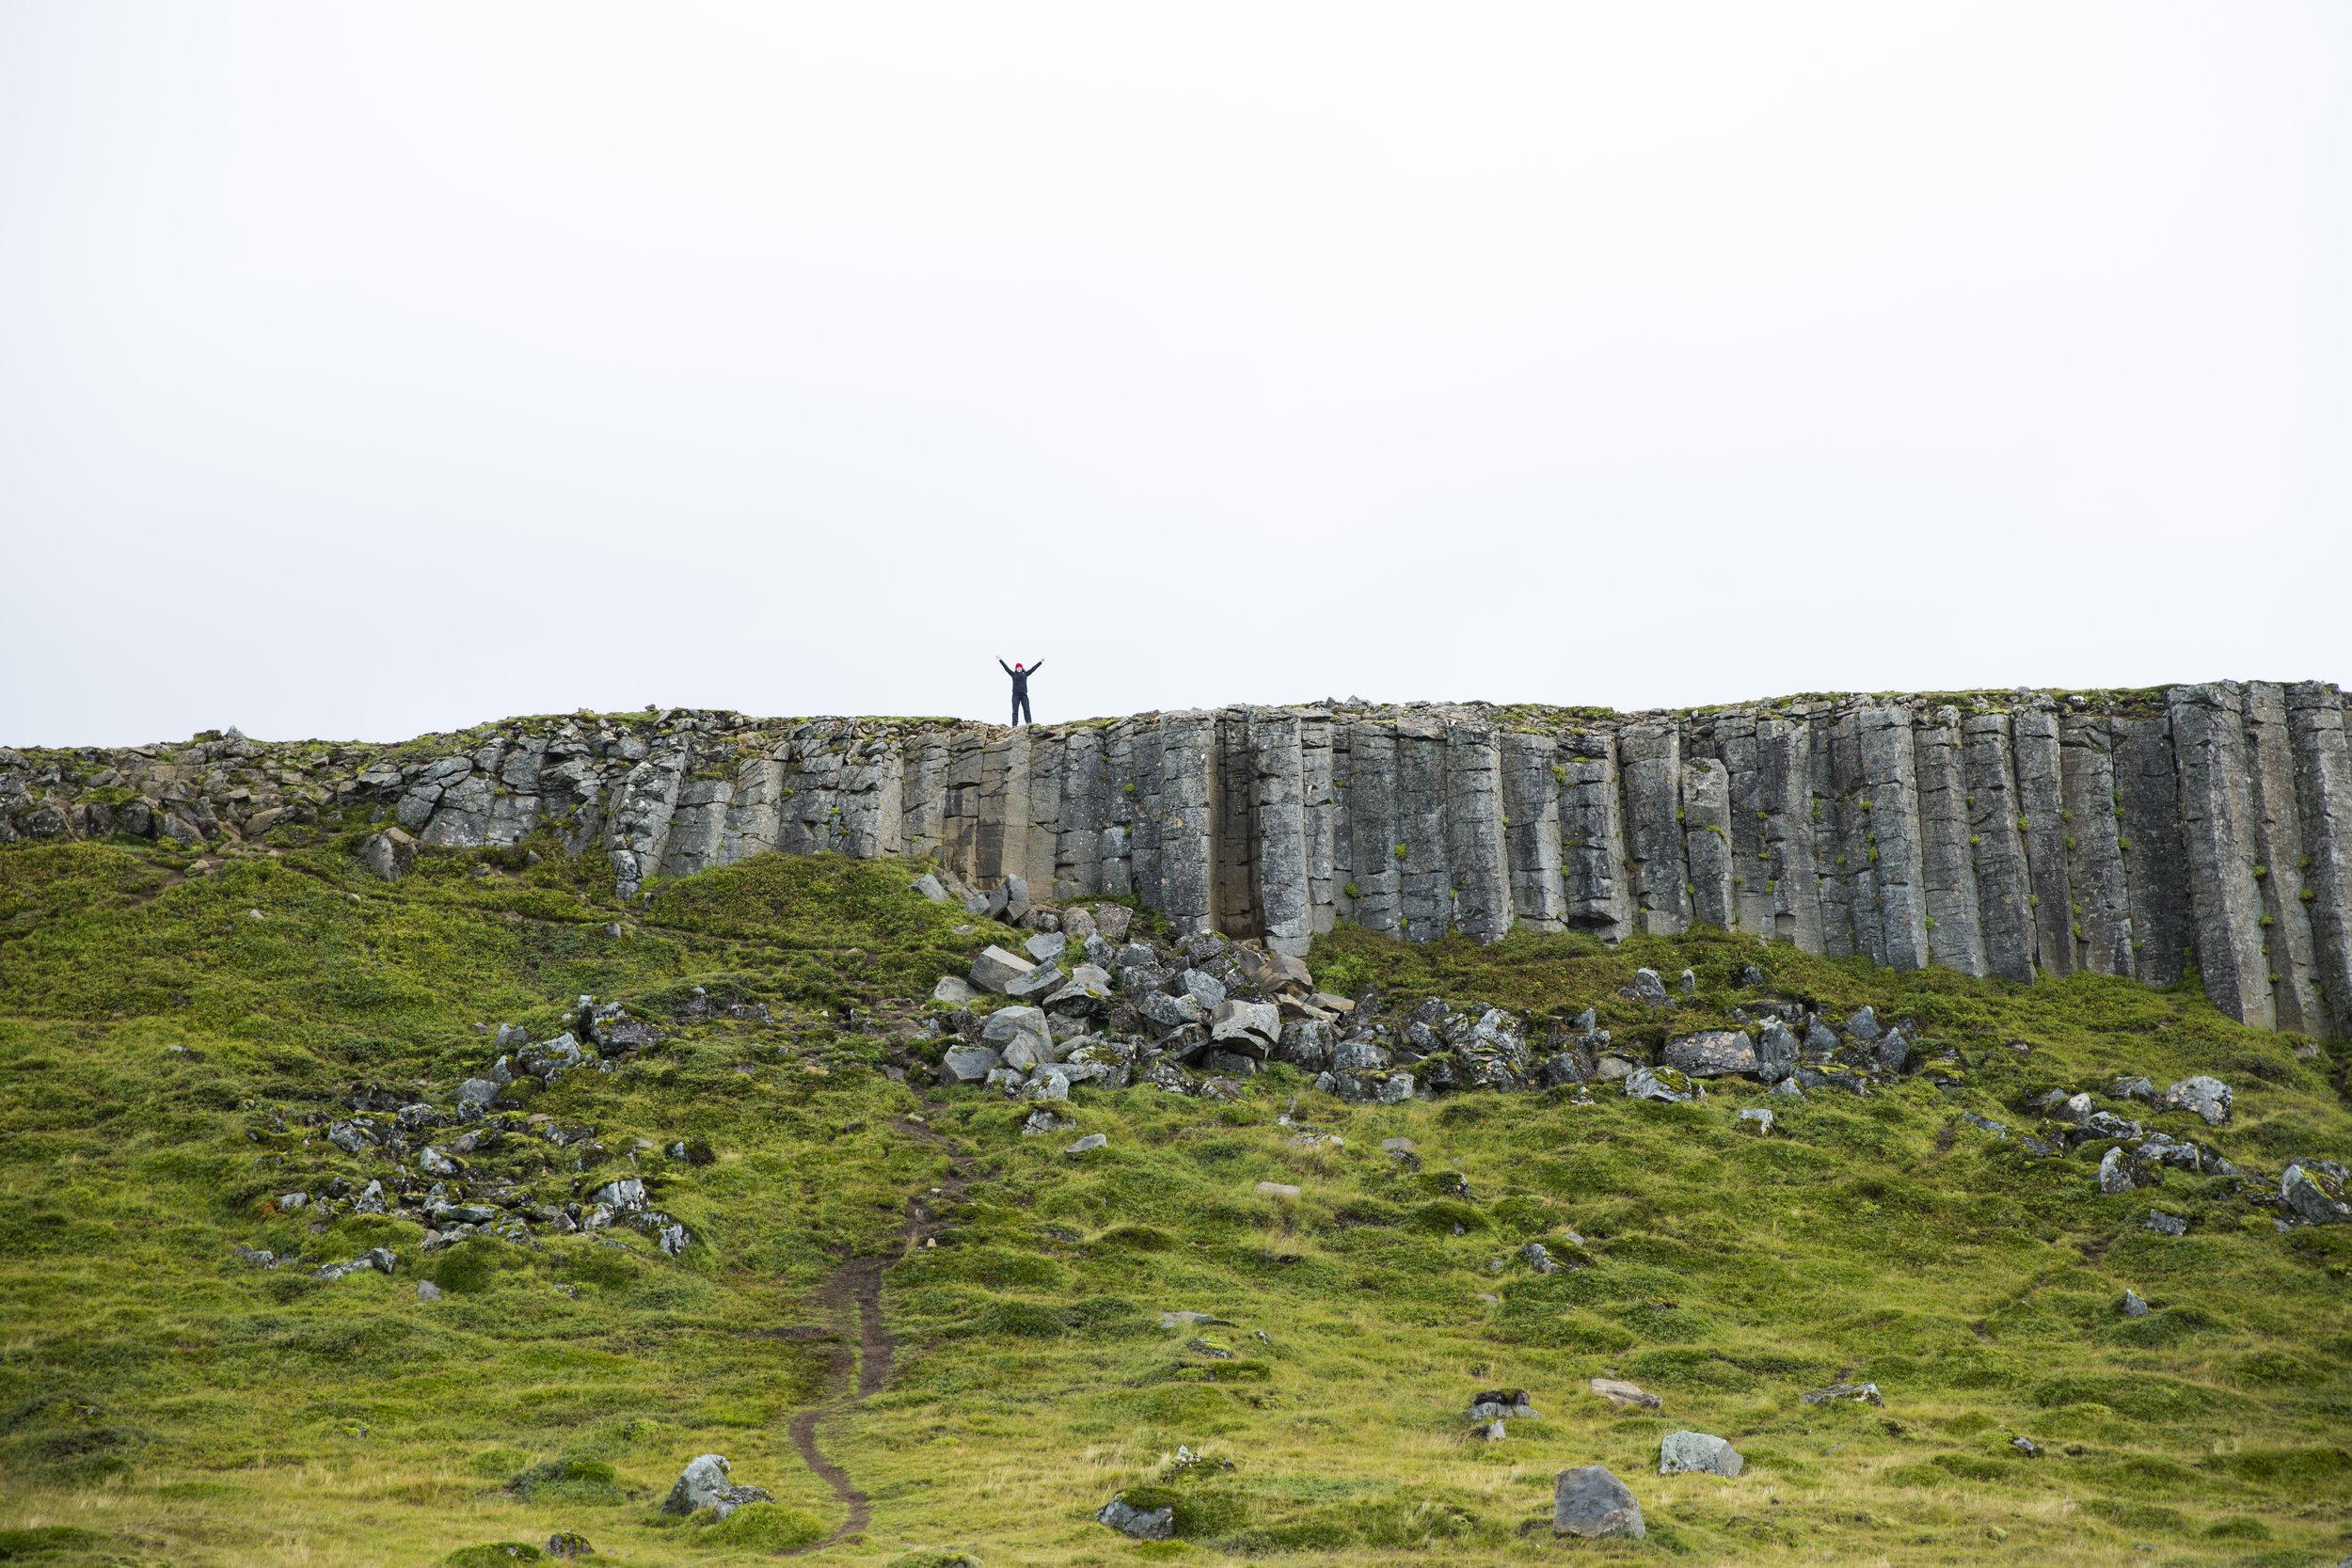 iceland_basalt_cliffs_01.jpg